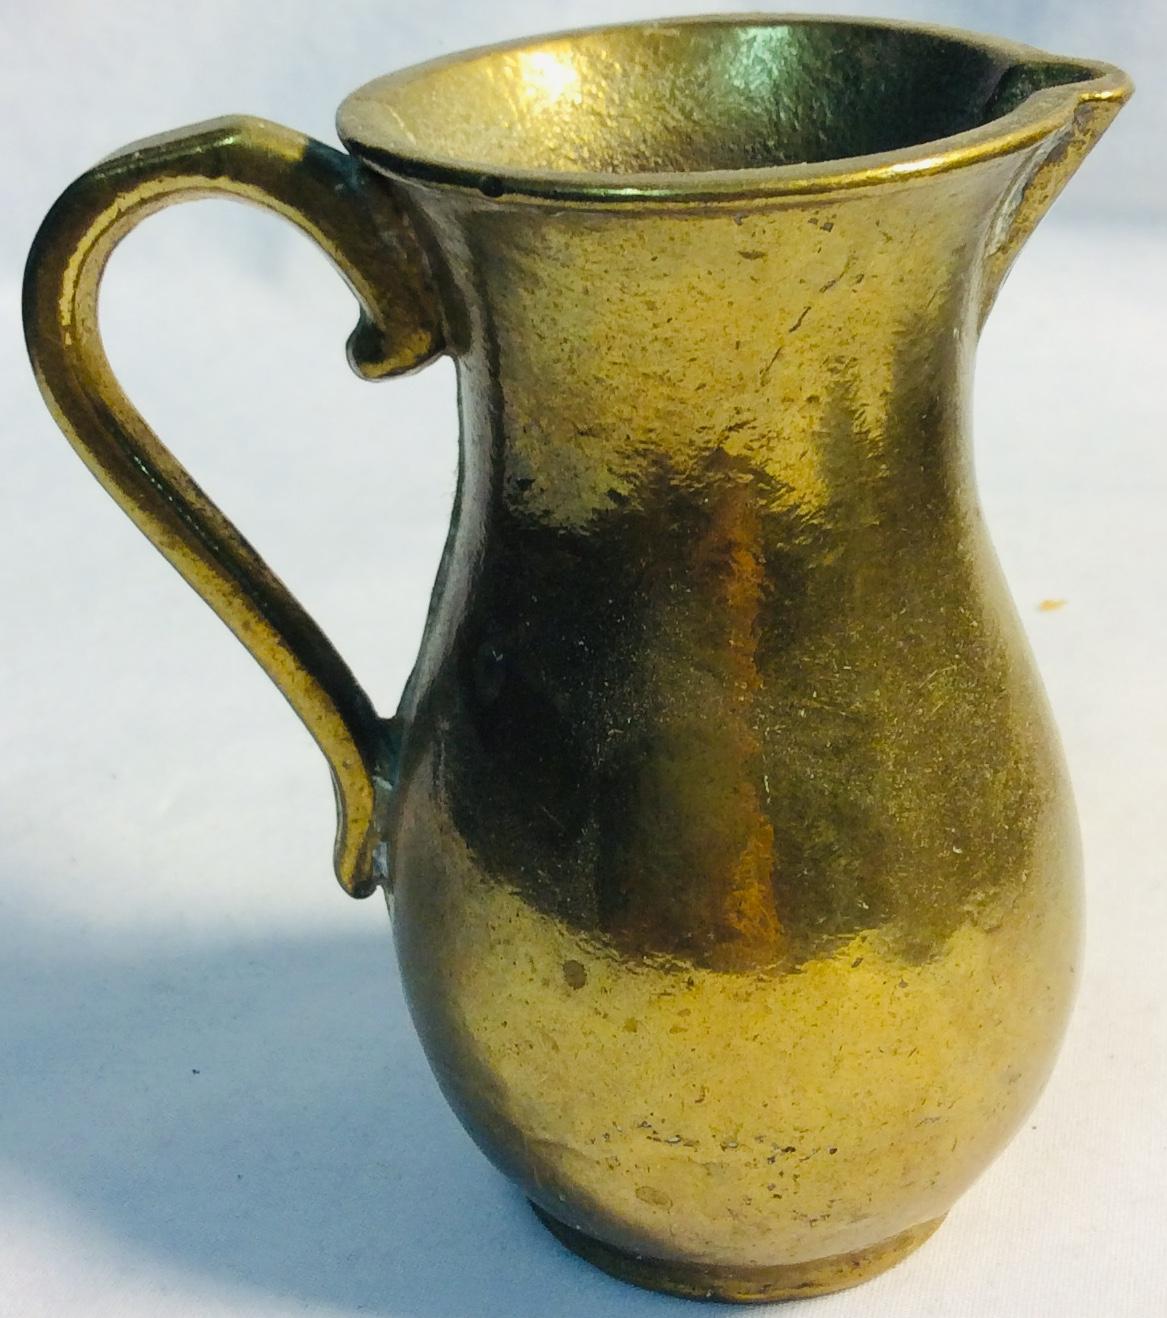 Small ritual golden jug